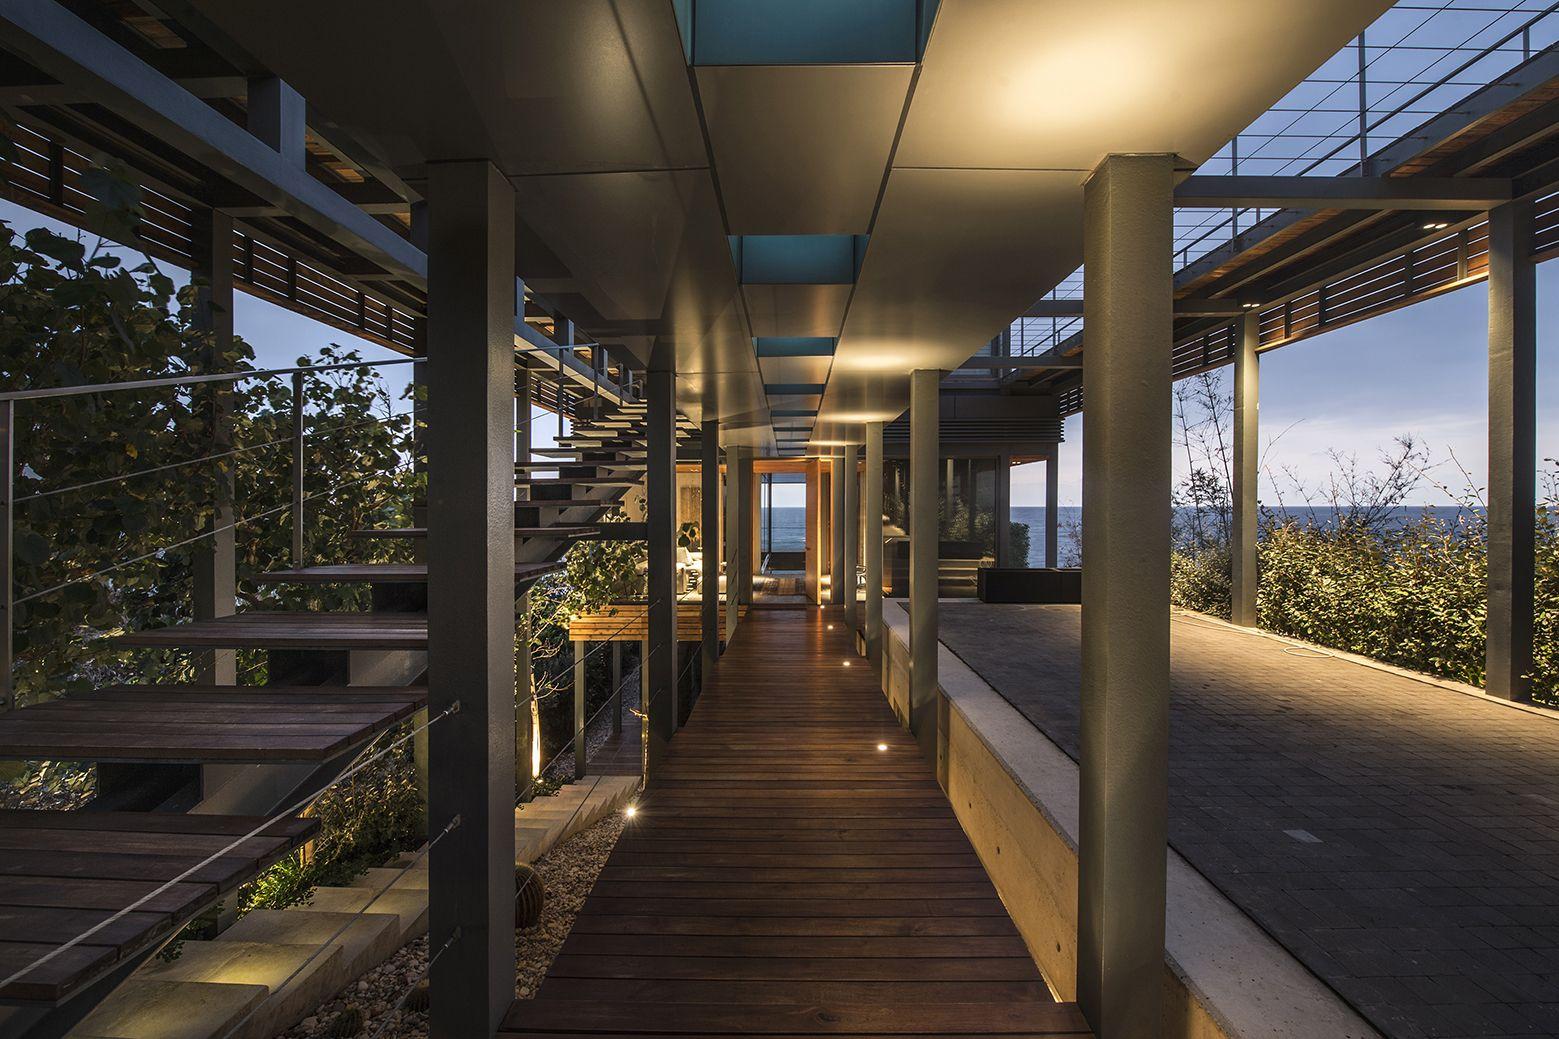 Galería - Residencia Amchit / BLANKPAGE Architects - 41